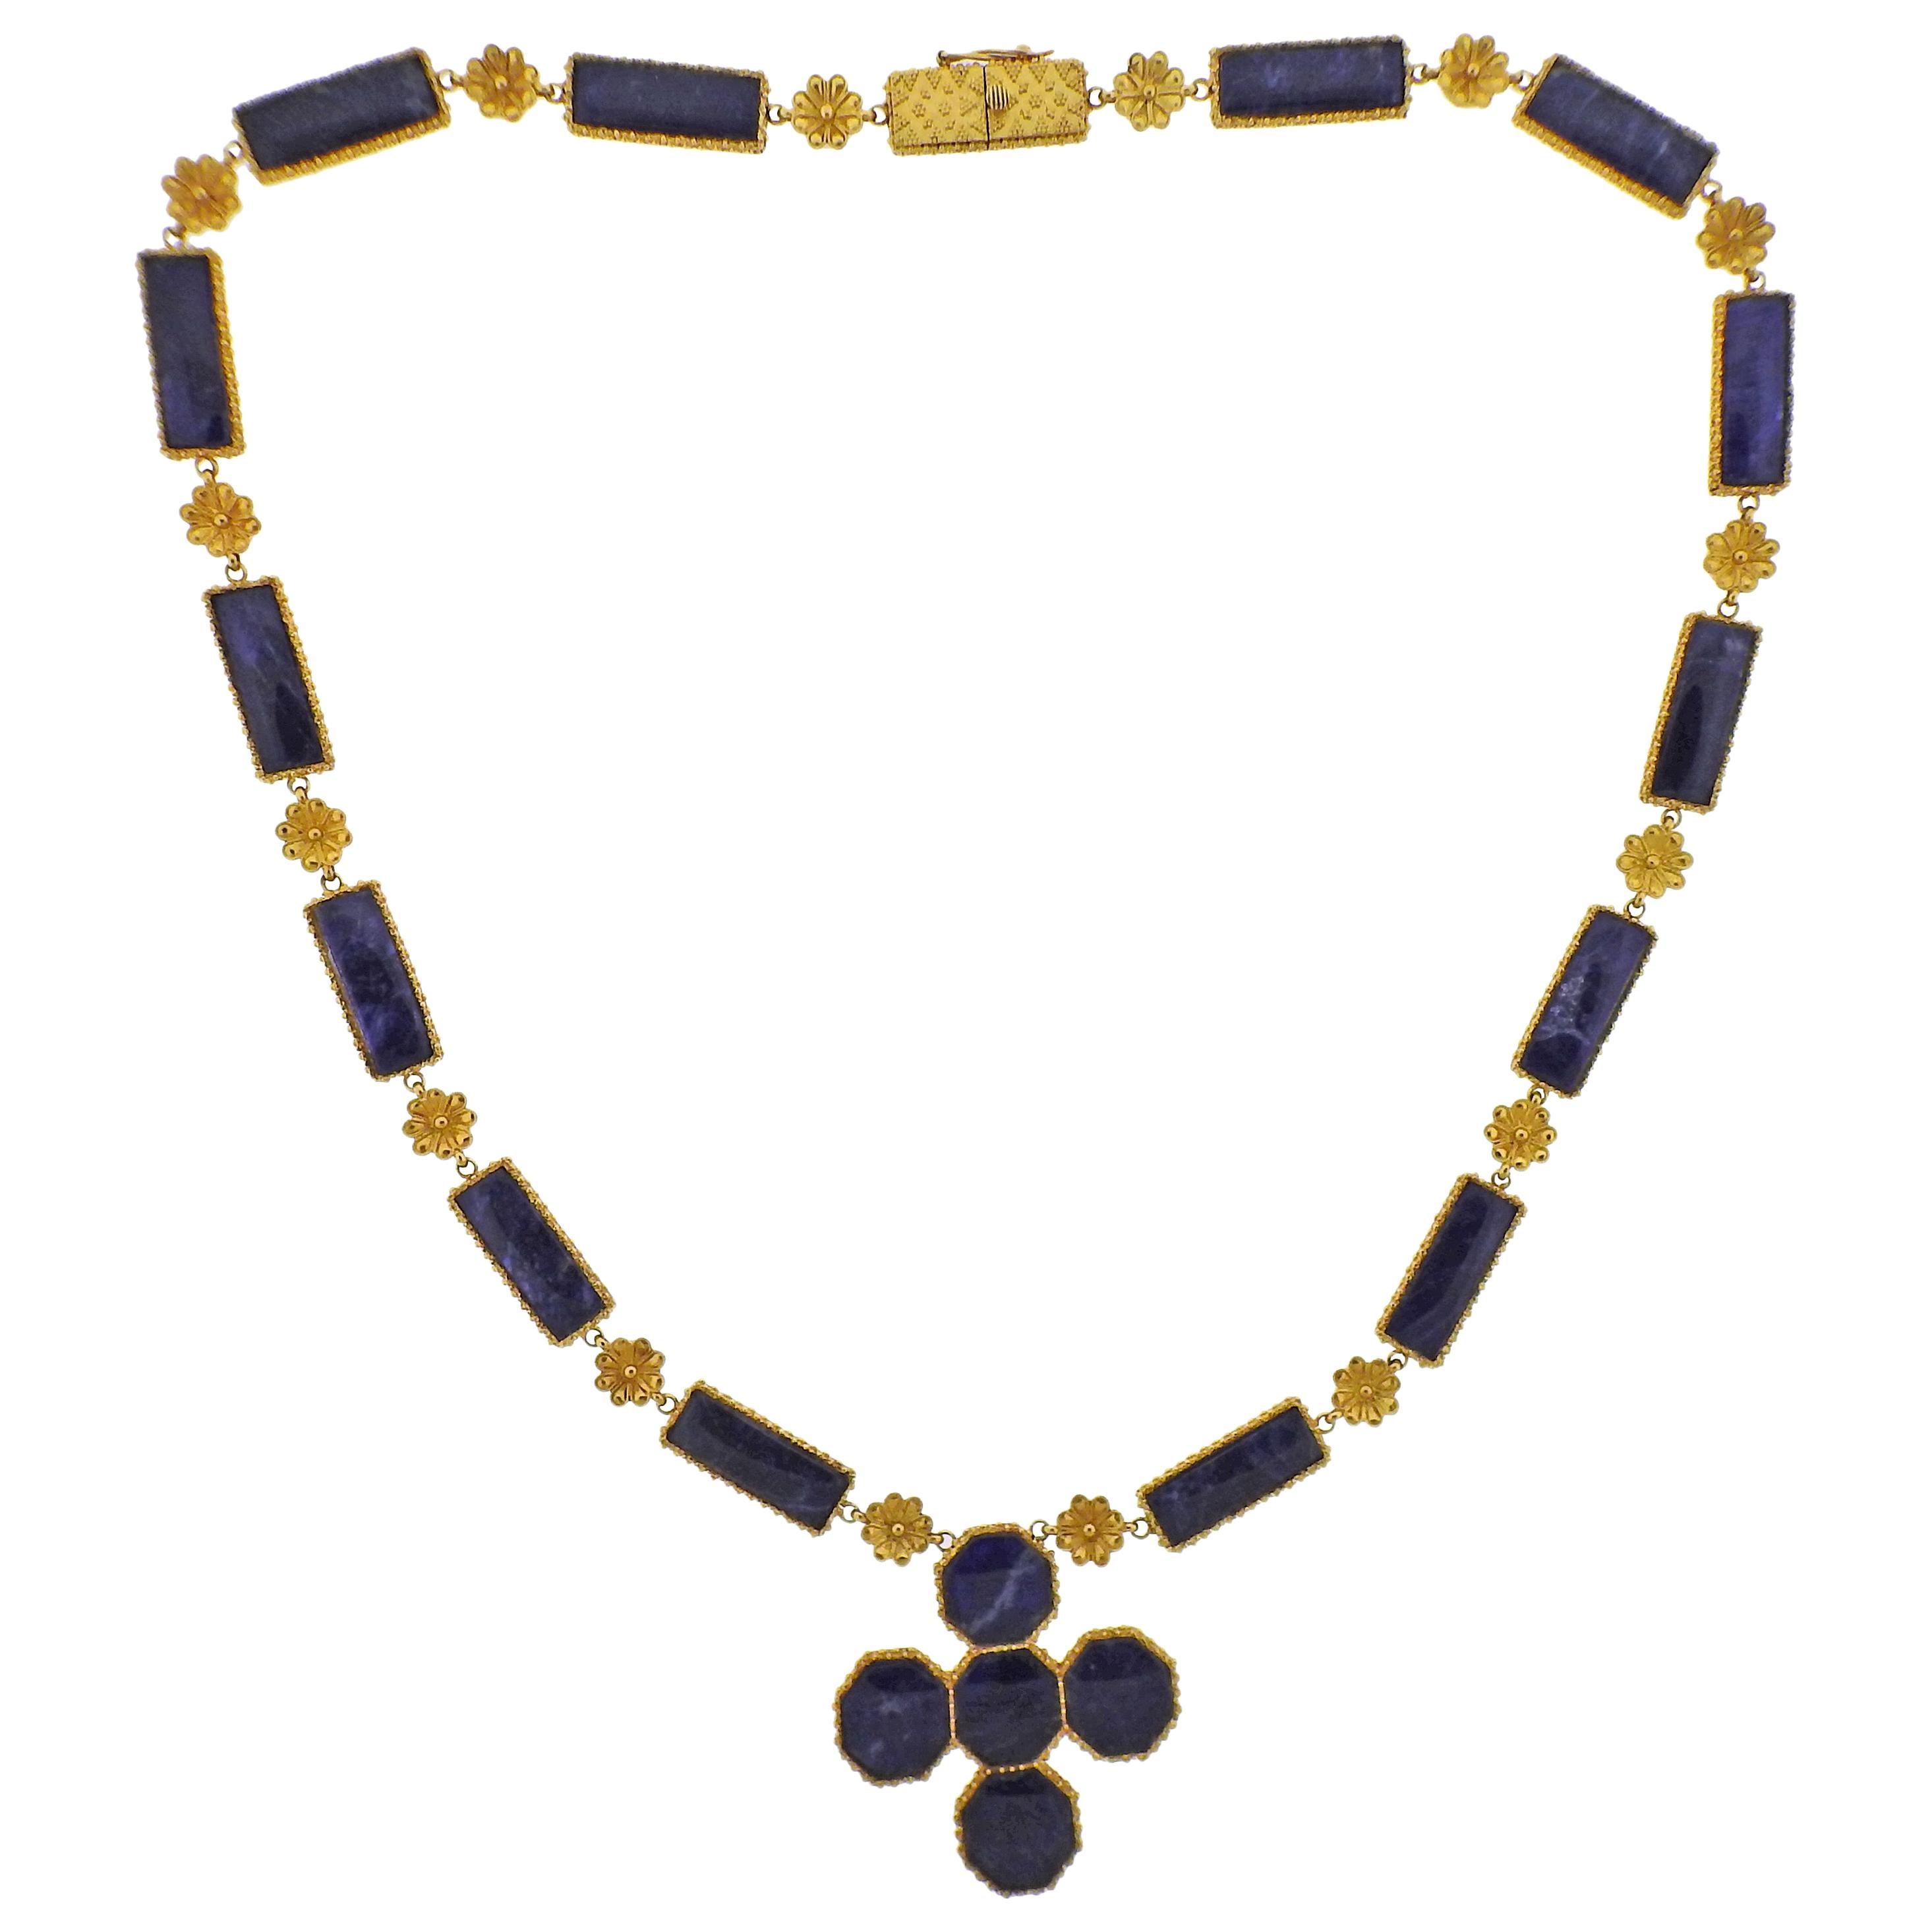 Lalaounis Greece Gold Sodalite Pendant Necklace